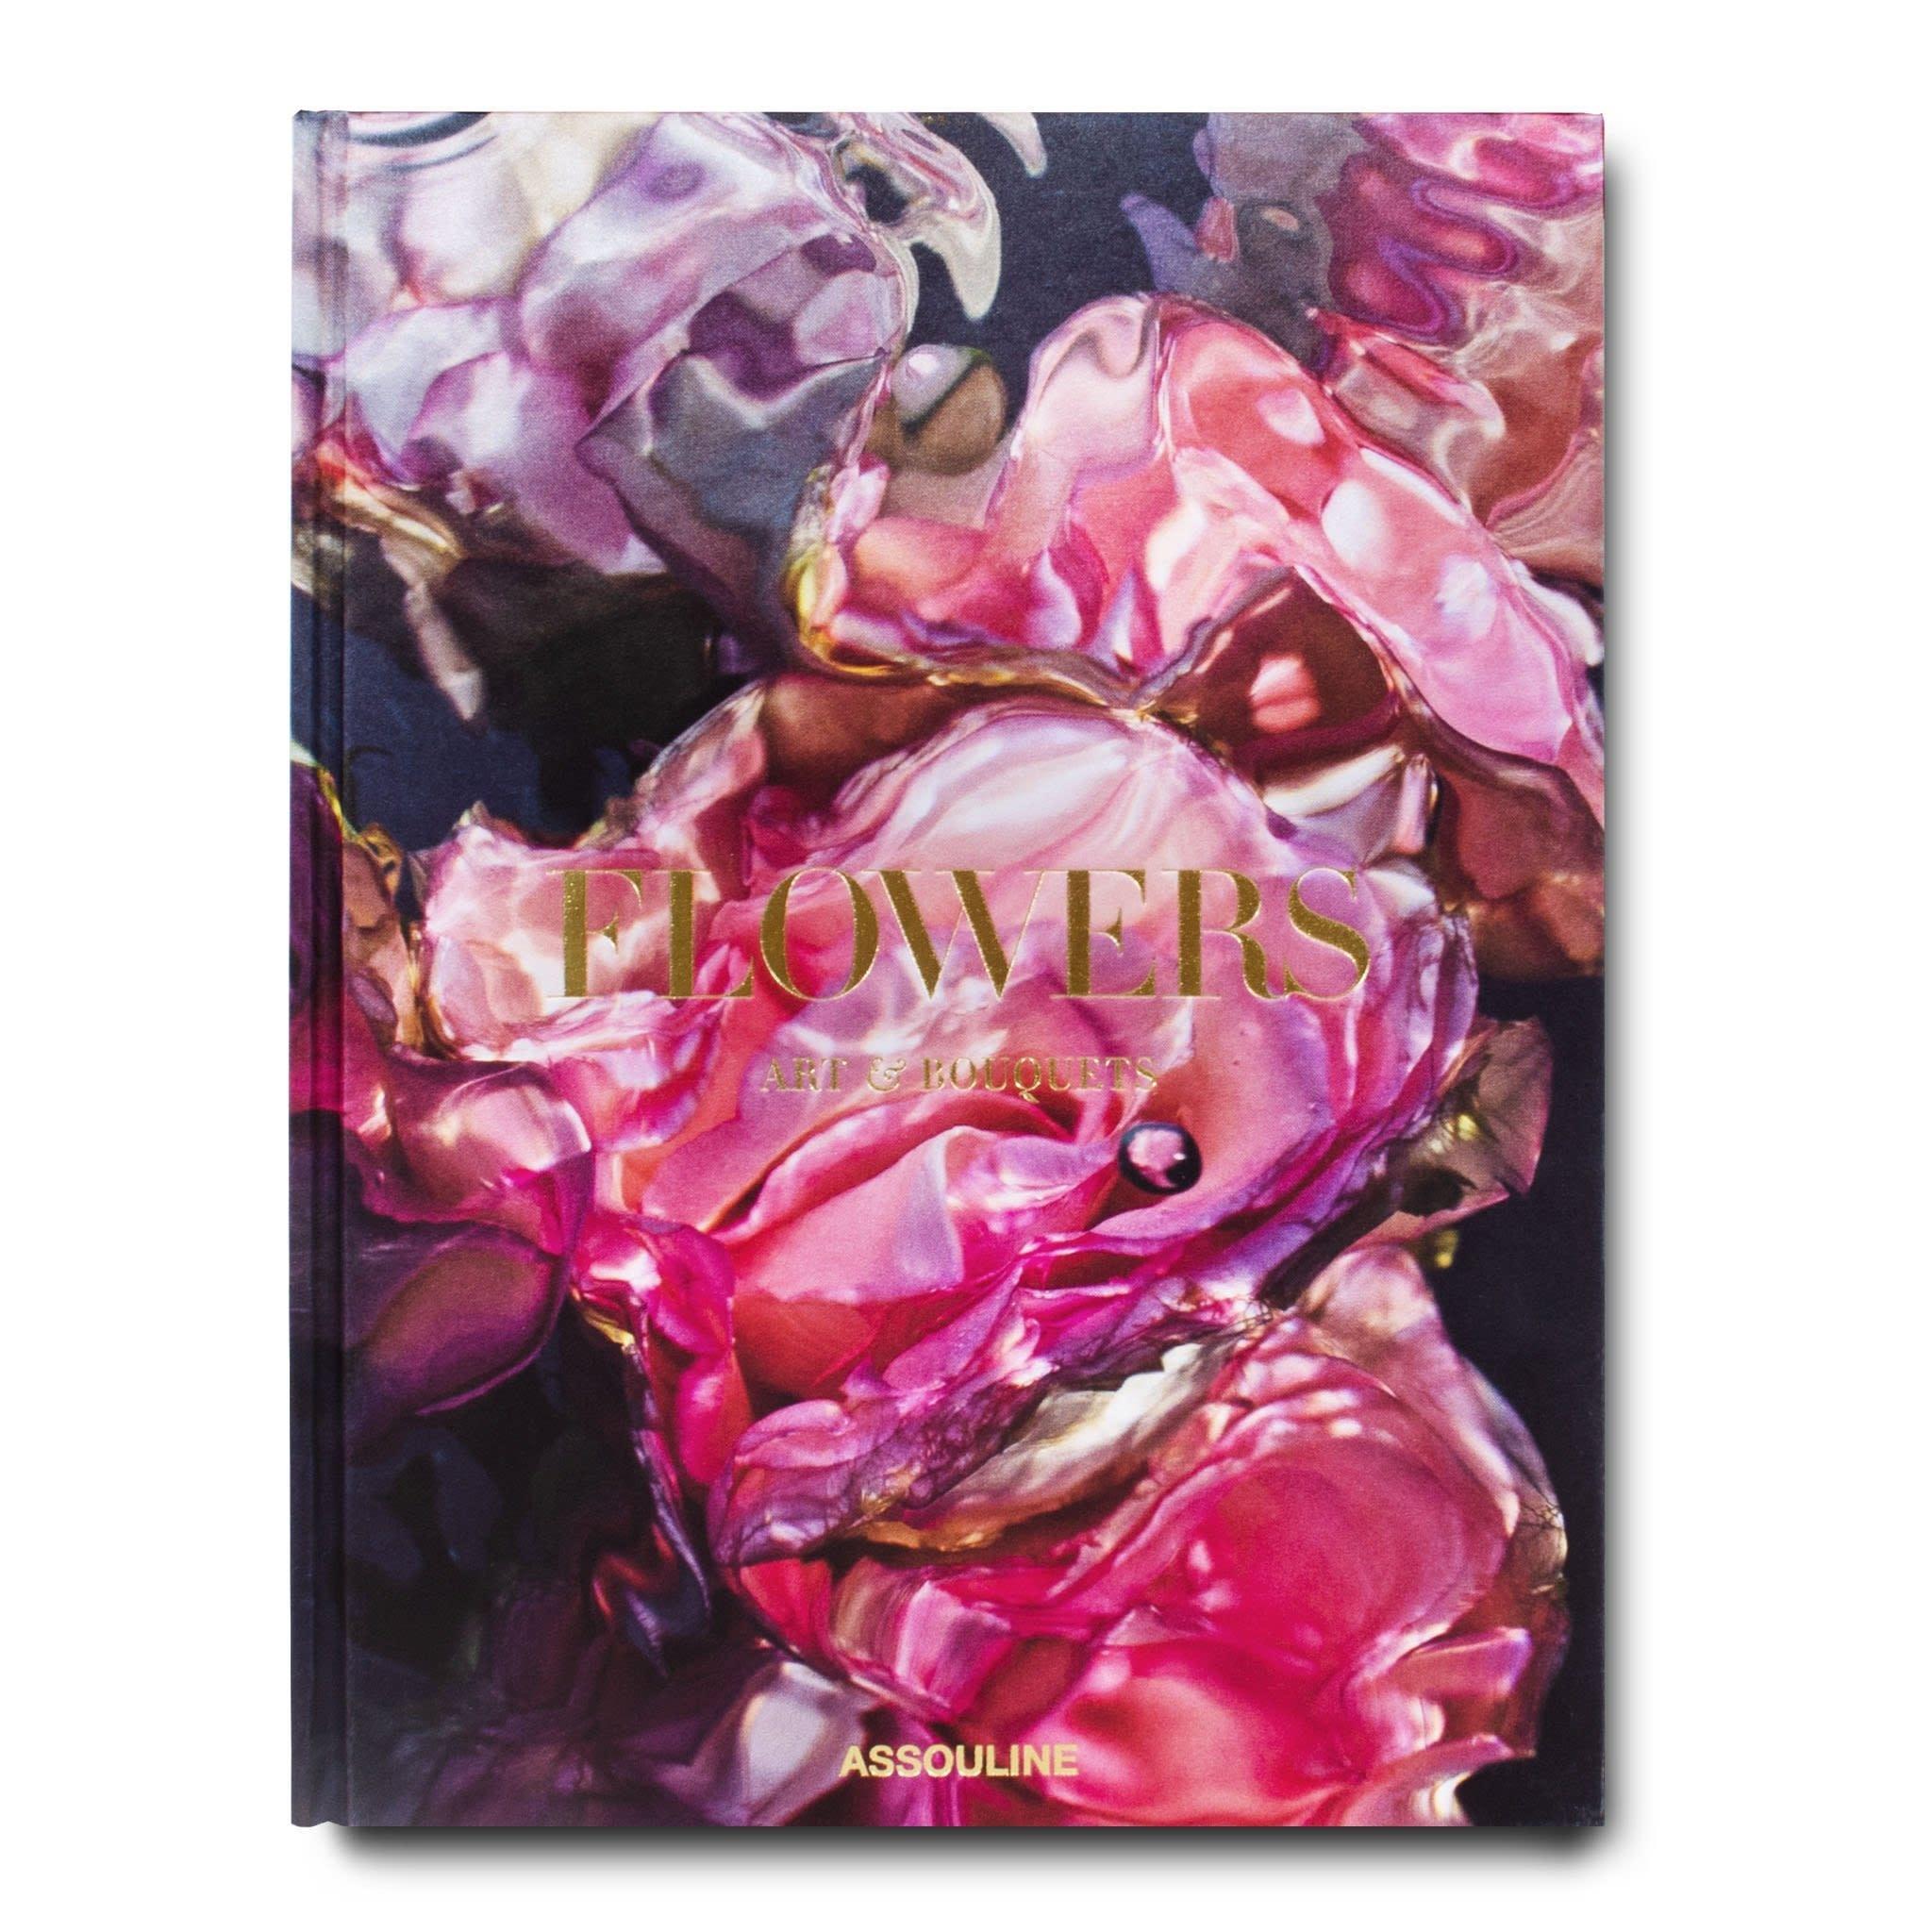 Assouline Flowers Art & Bouquets